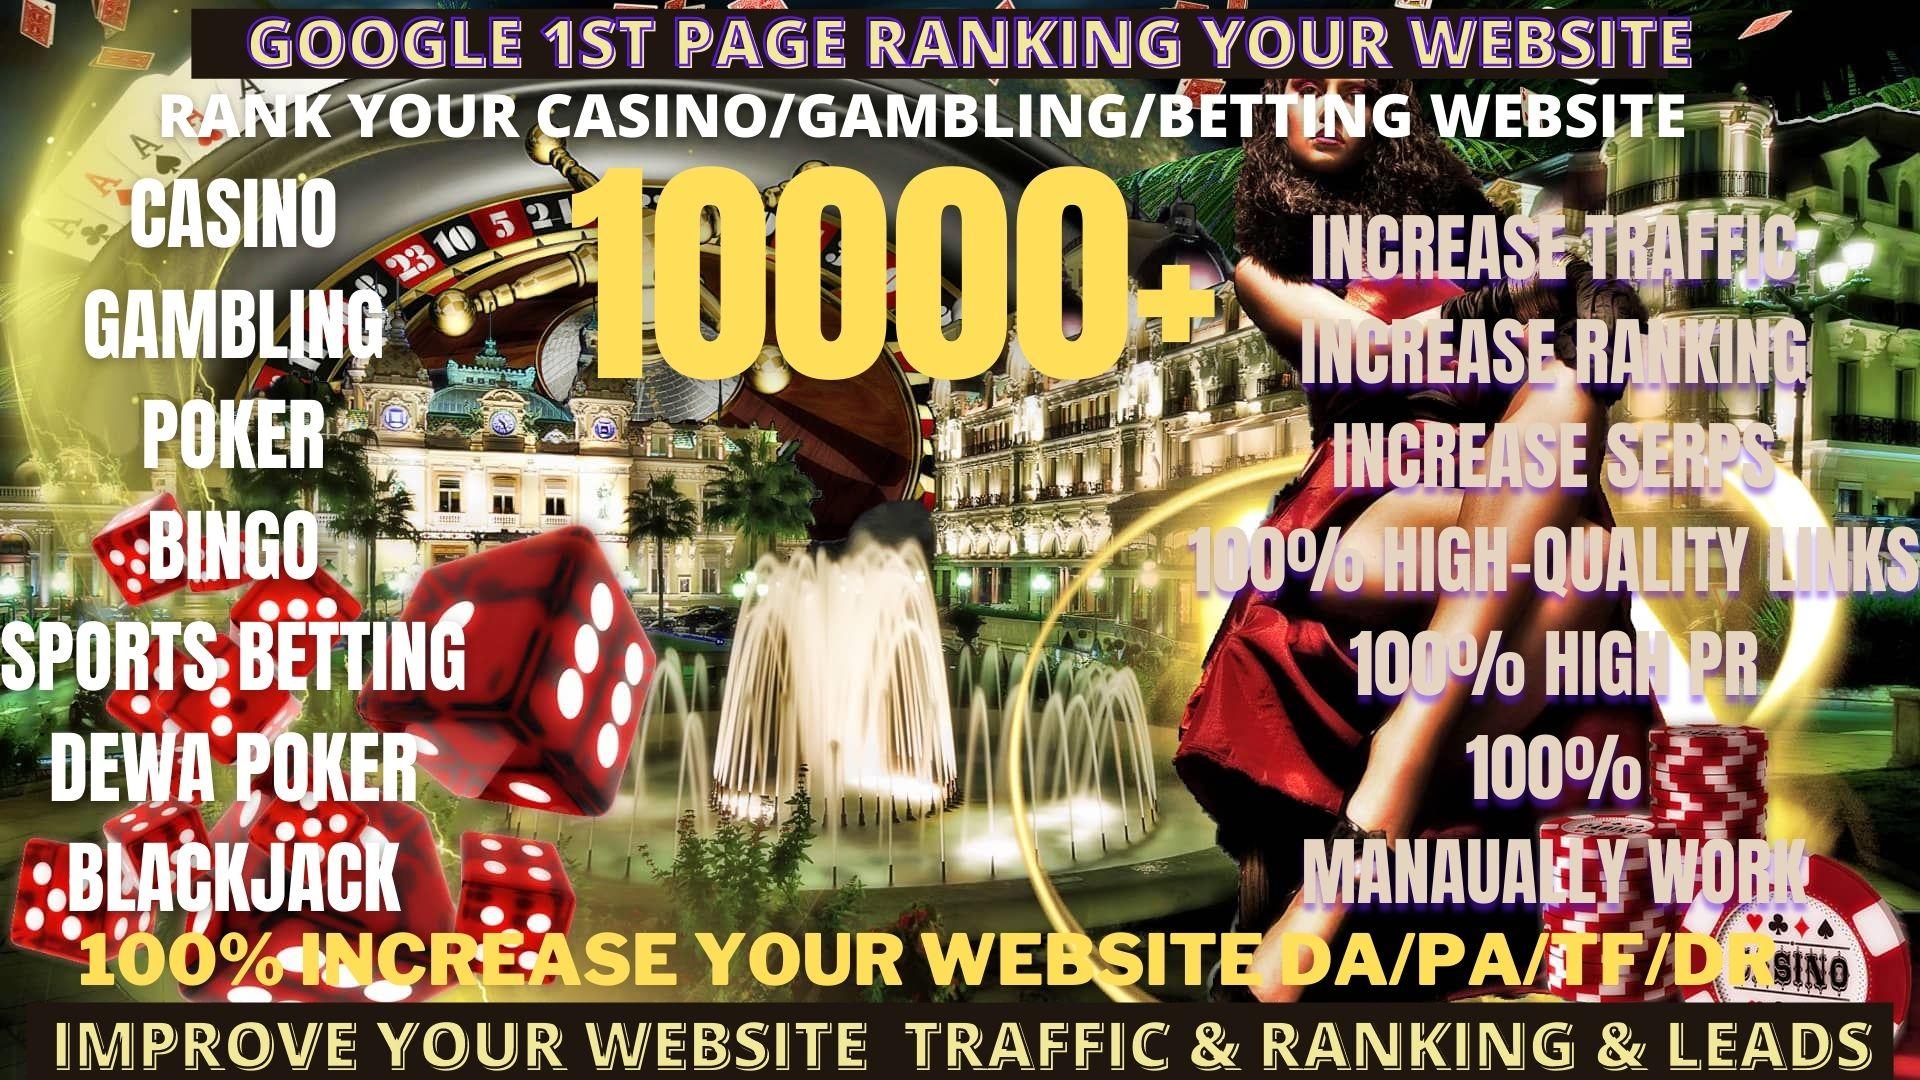 Get 10,000 permanent DA50+PA40+homepage pbn backlinks ufabet, casino, gambling, poker, judi related site